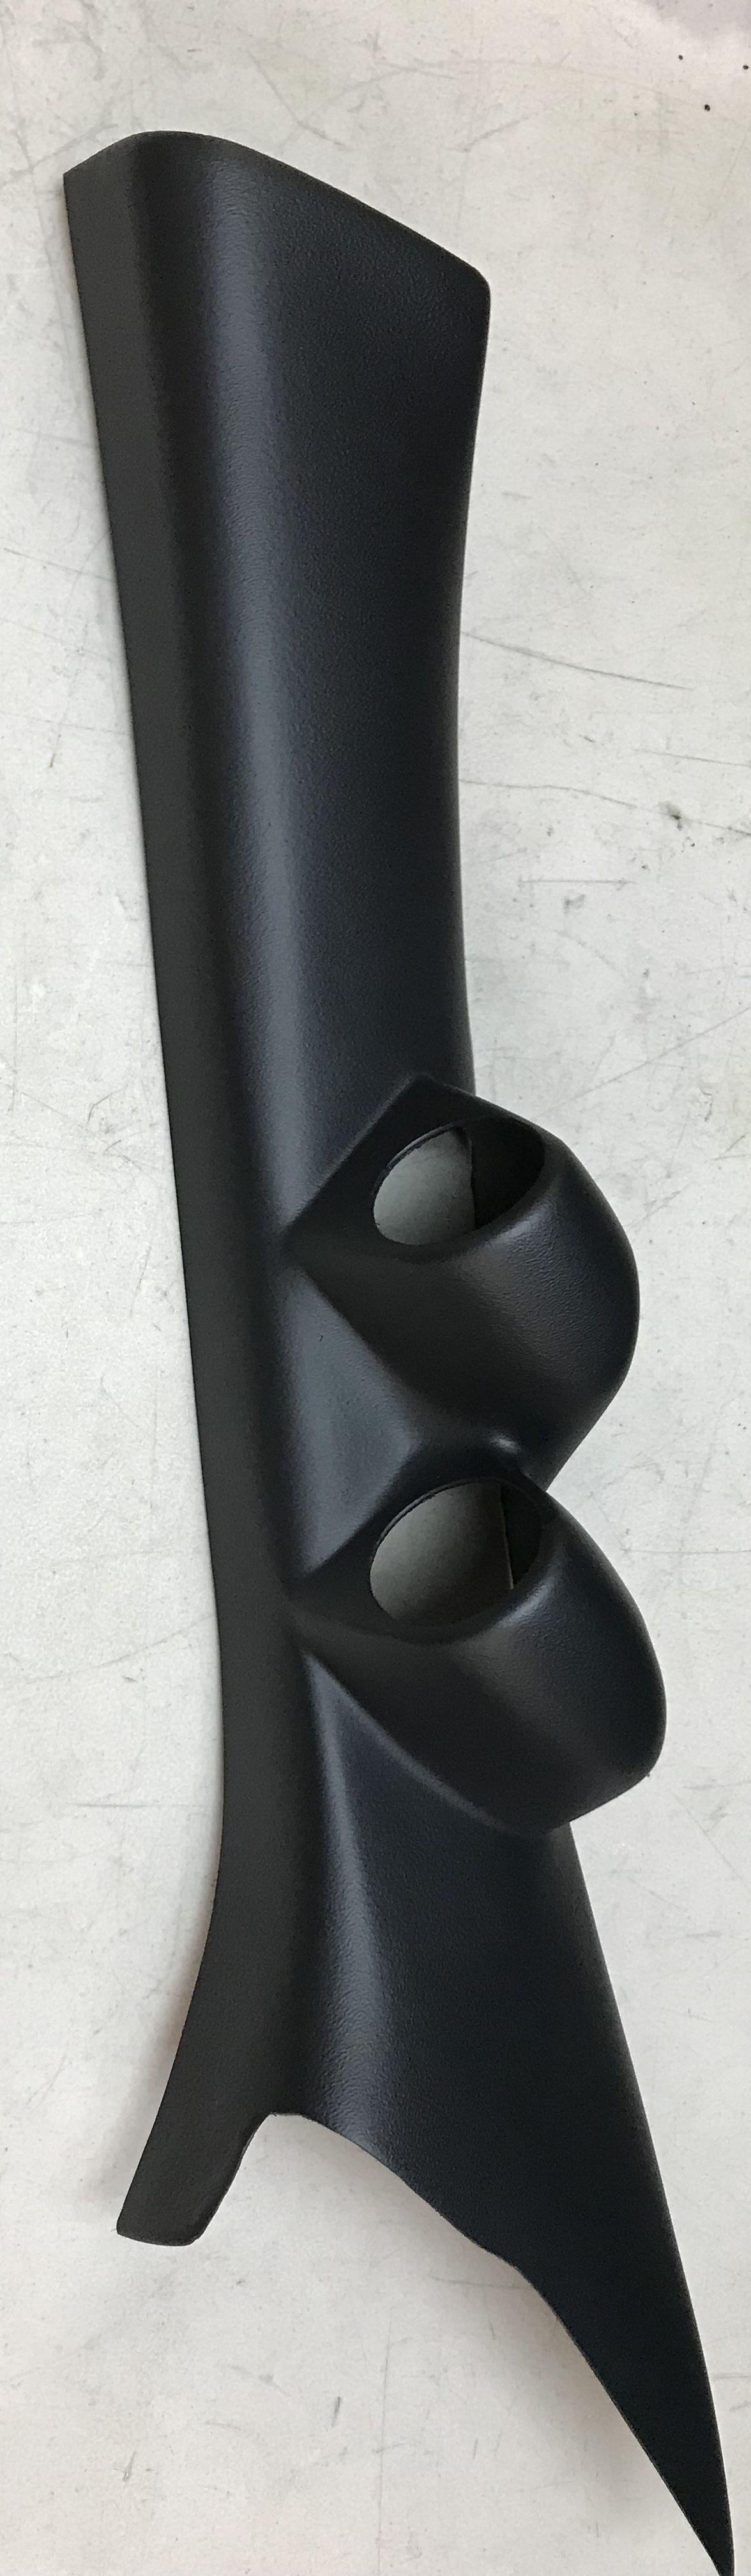 Wk2 Dual Pillar Pod 2012 2019 Pods Pillars Jeep Grand Cherokee Srt